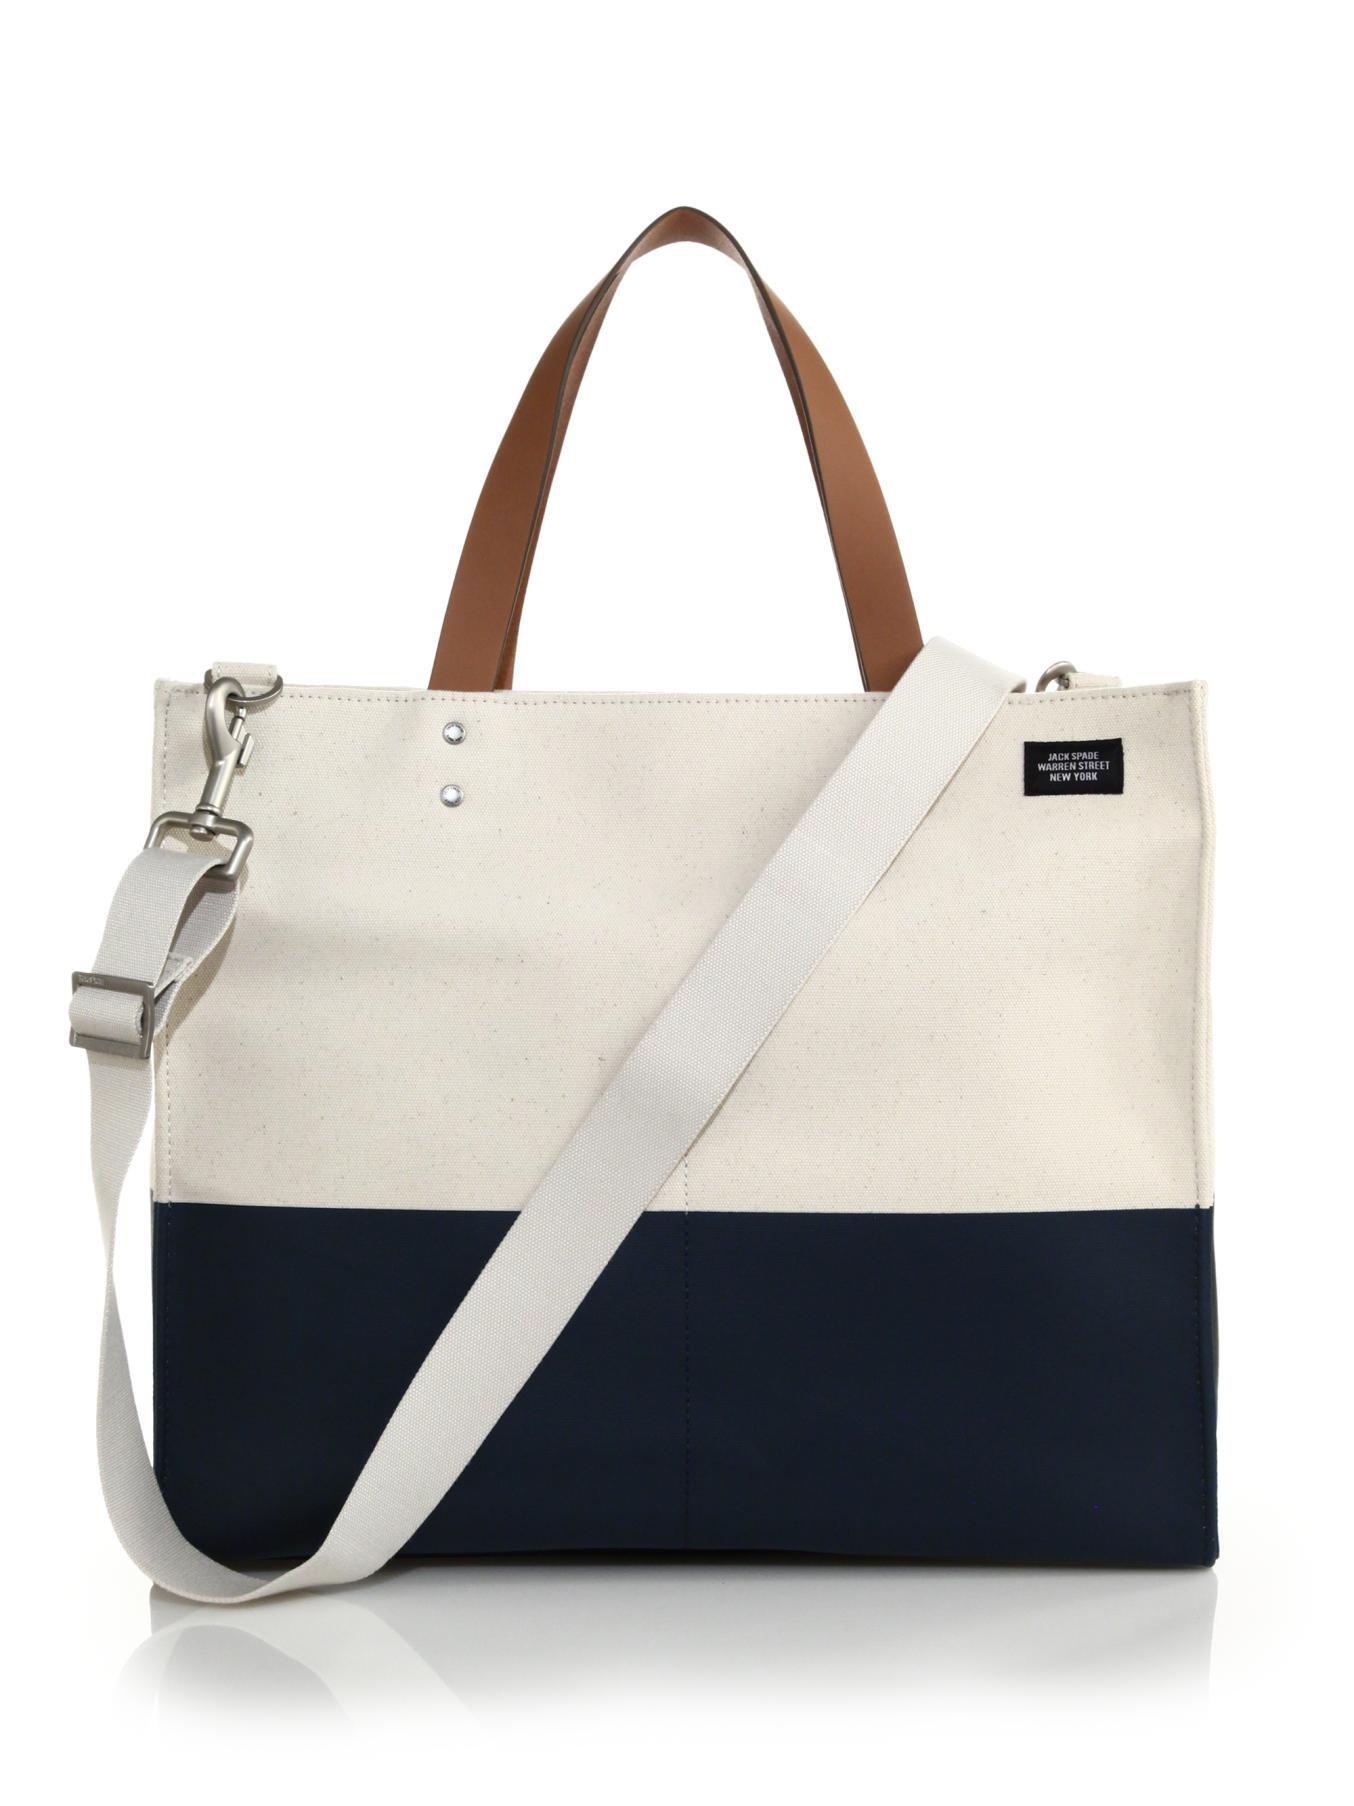 01825364d Jack Spade Dipped Square Tote Bag in Natural for Men - Lyst